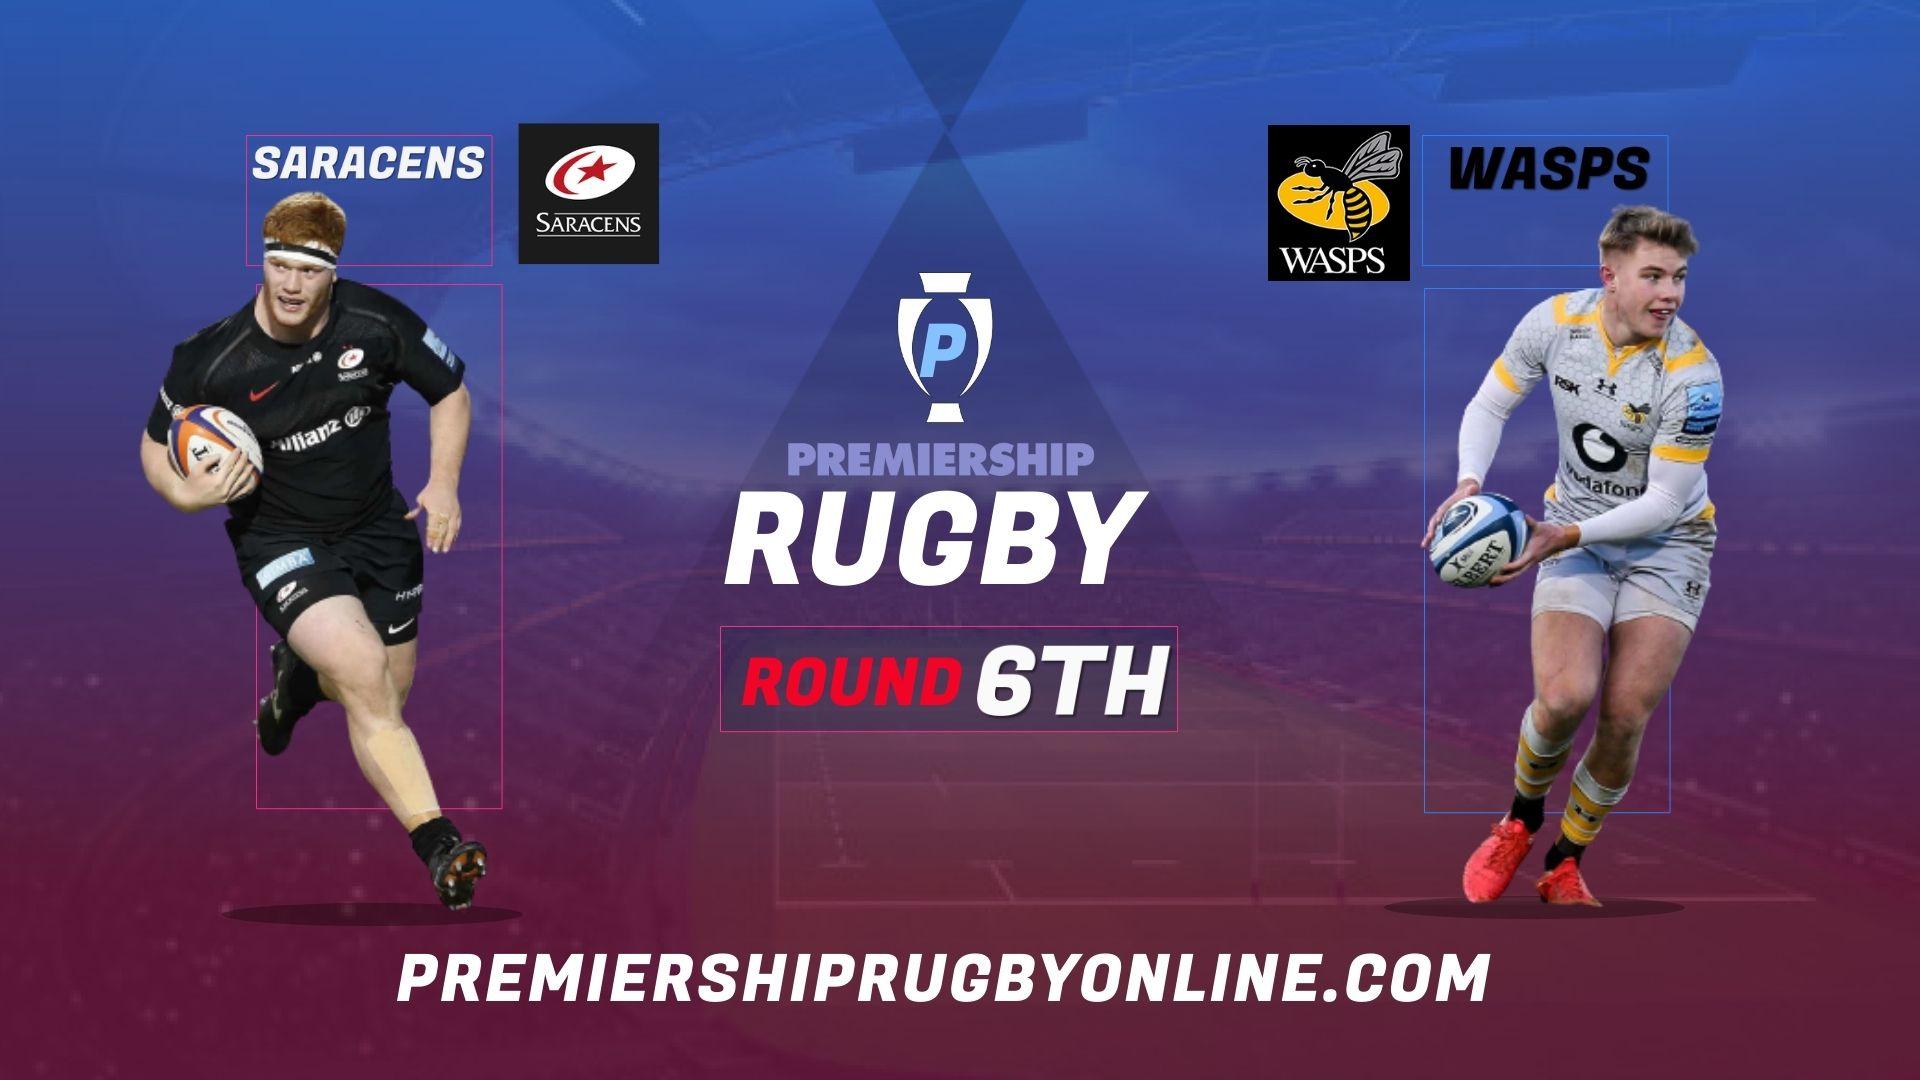 Saracens Vs Wasps Live Stream 2021-22 | Premiership Rugby Round 6